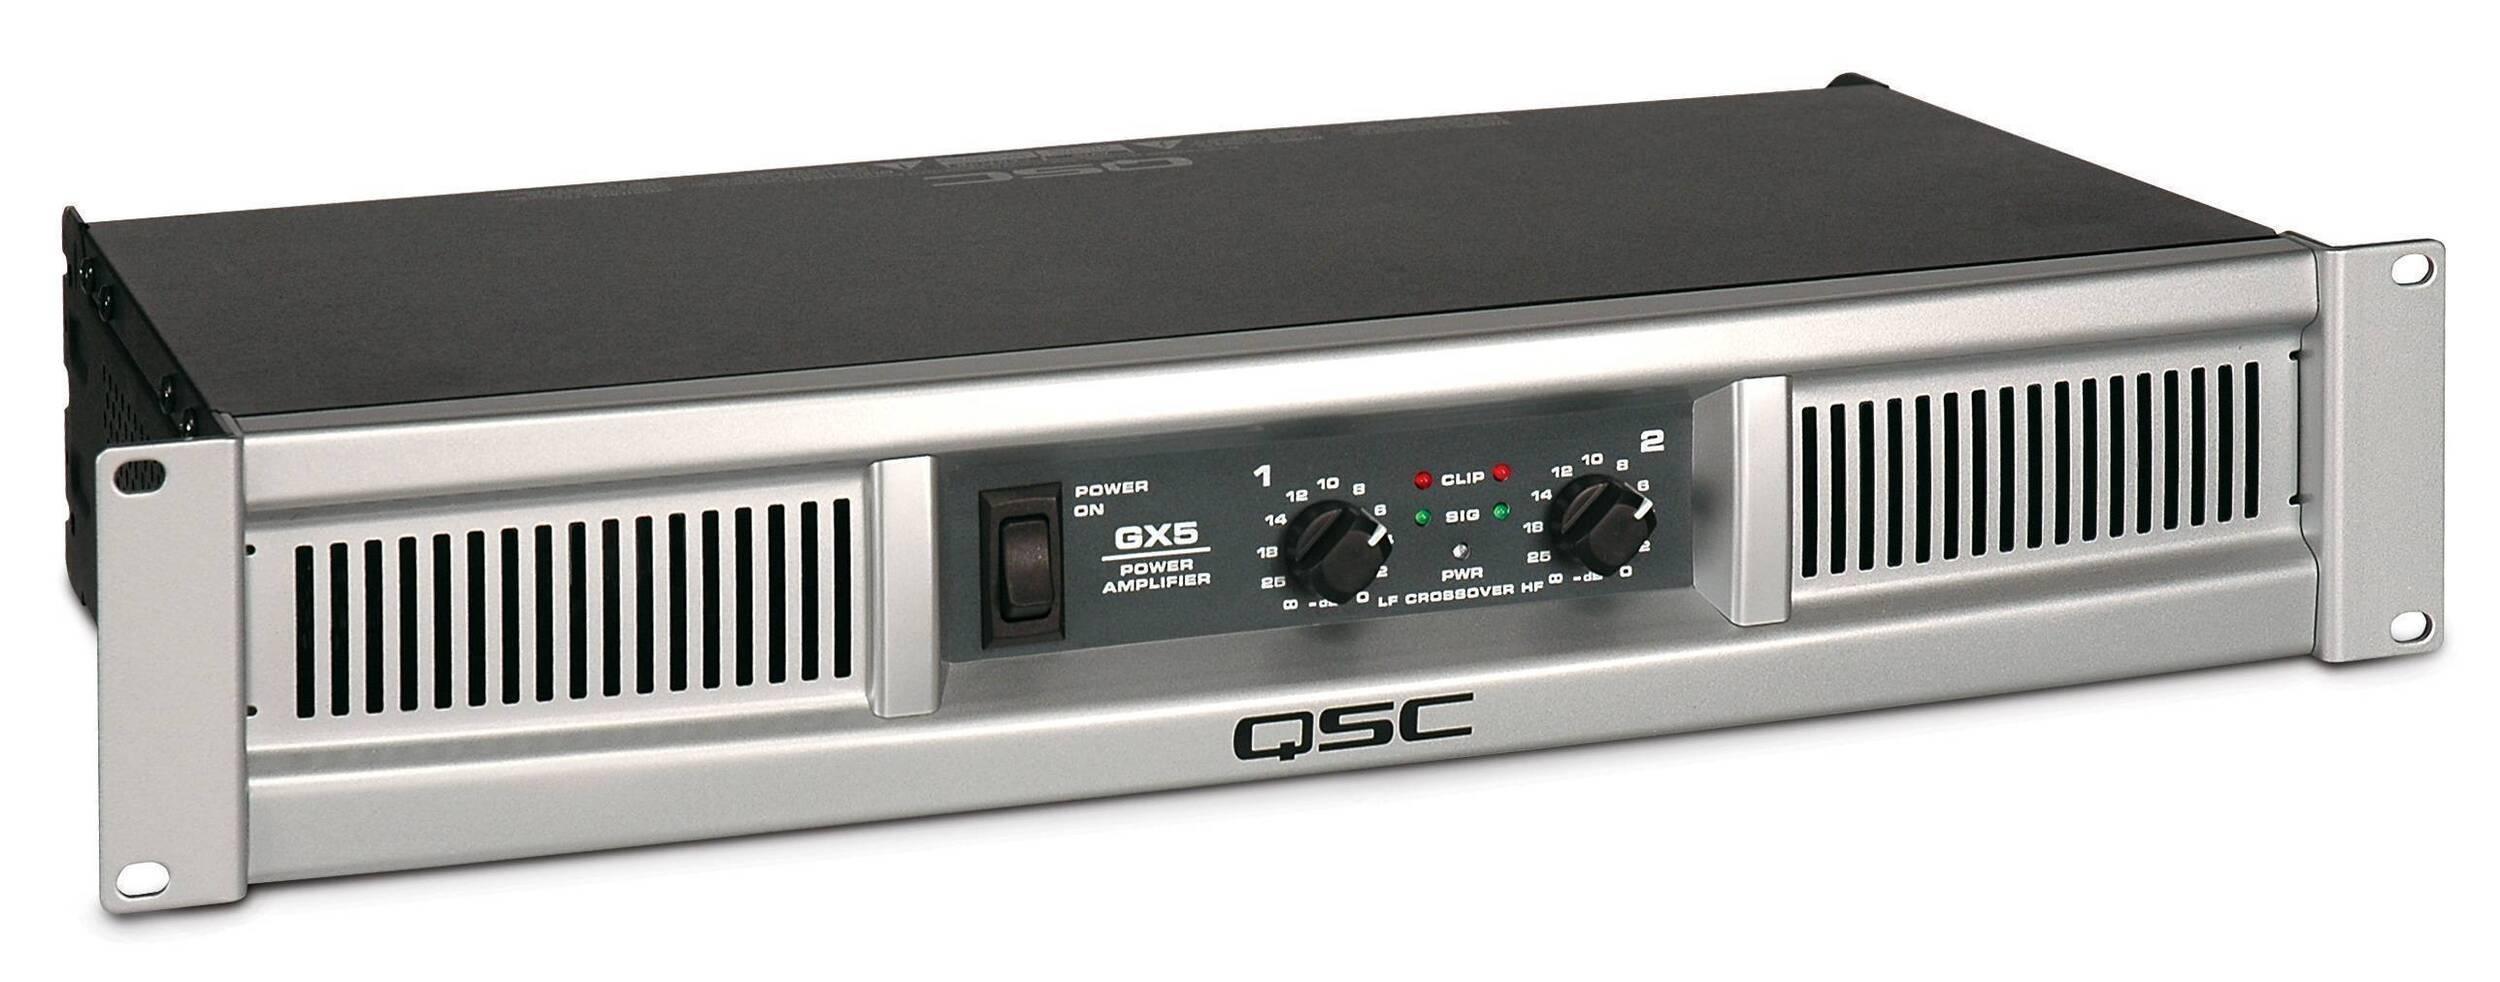 Amplificador estéreo QSC GX5